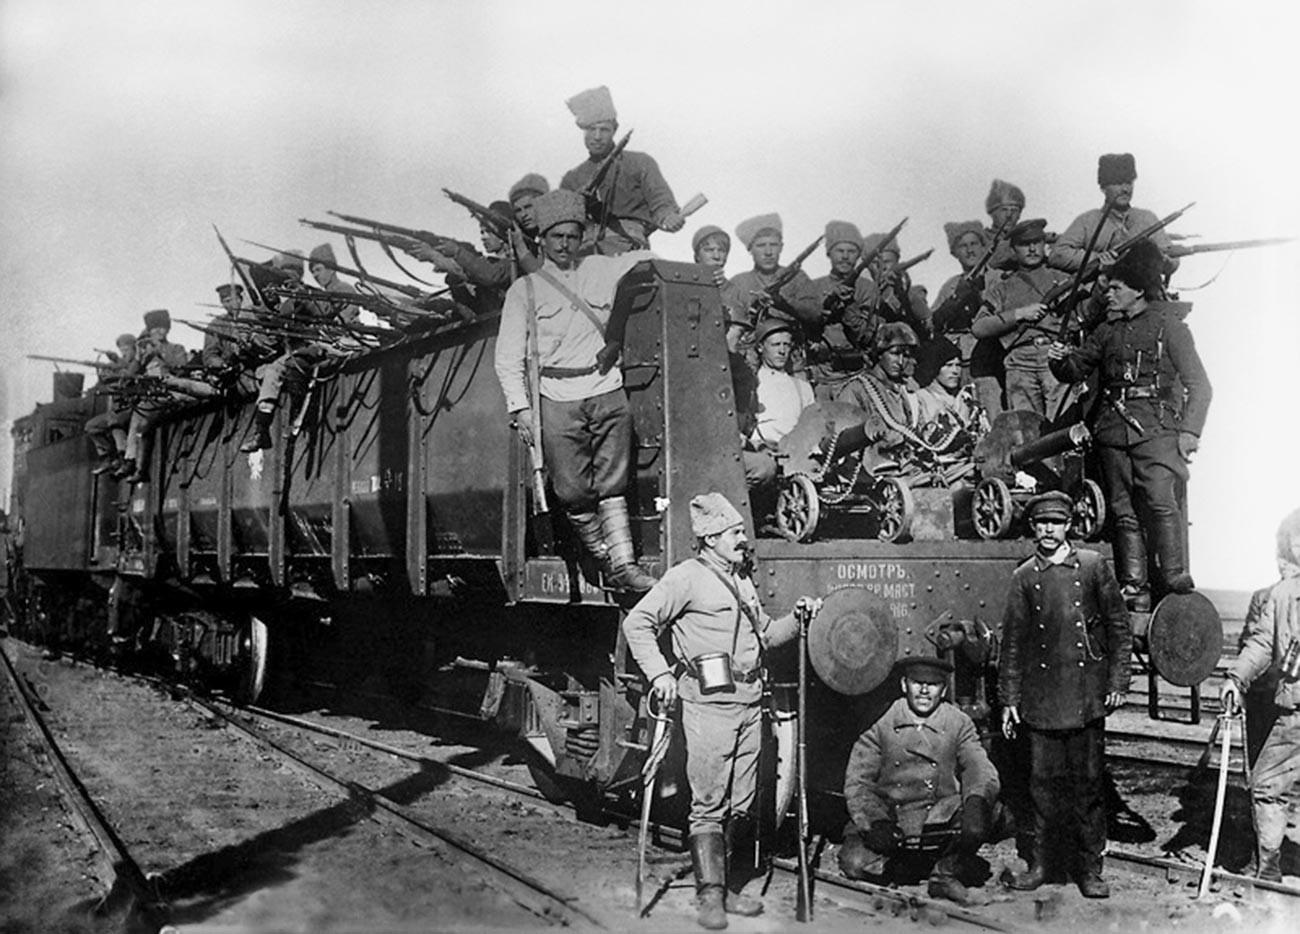 The Soviet armored train.